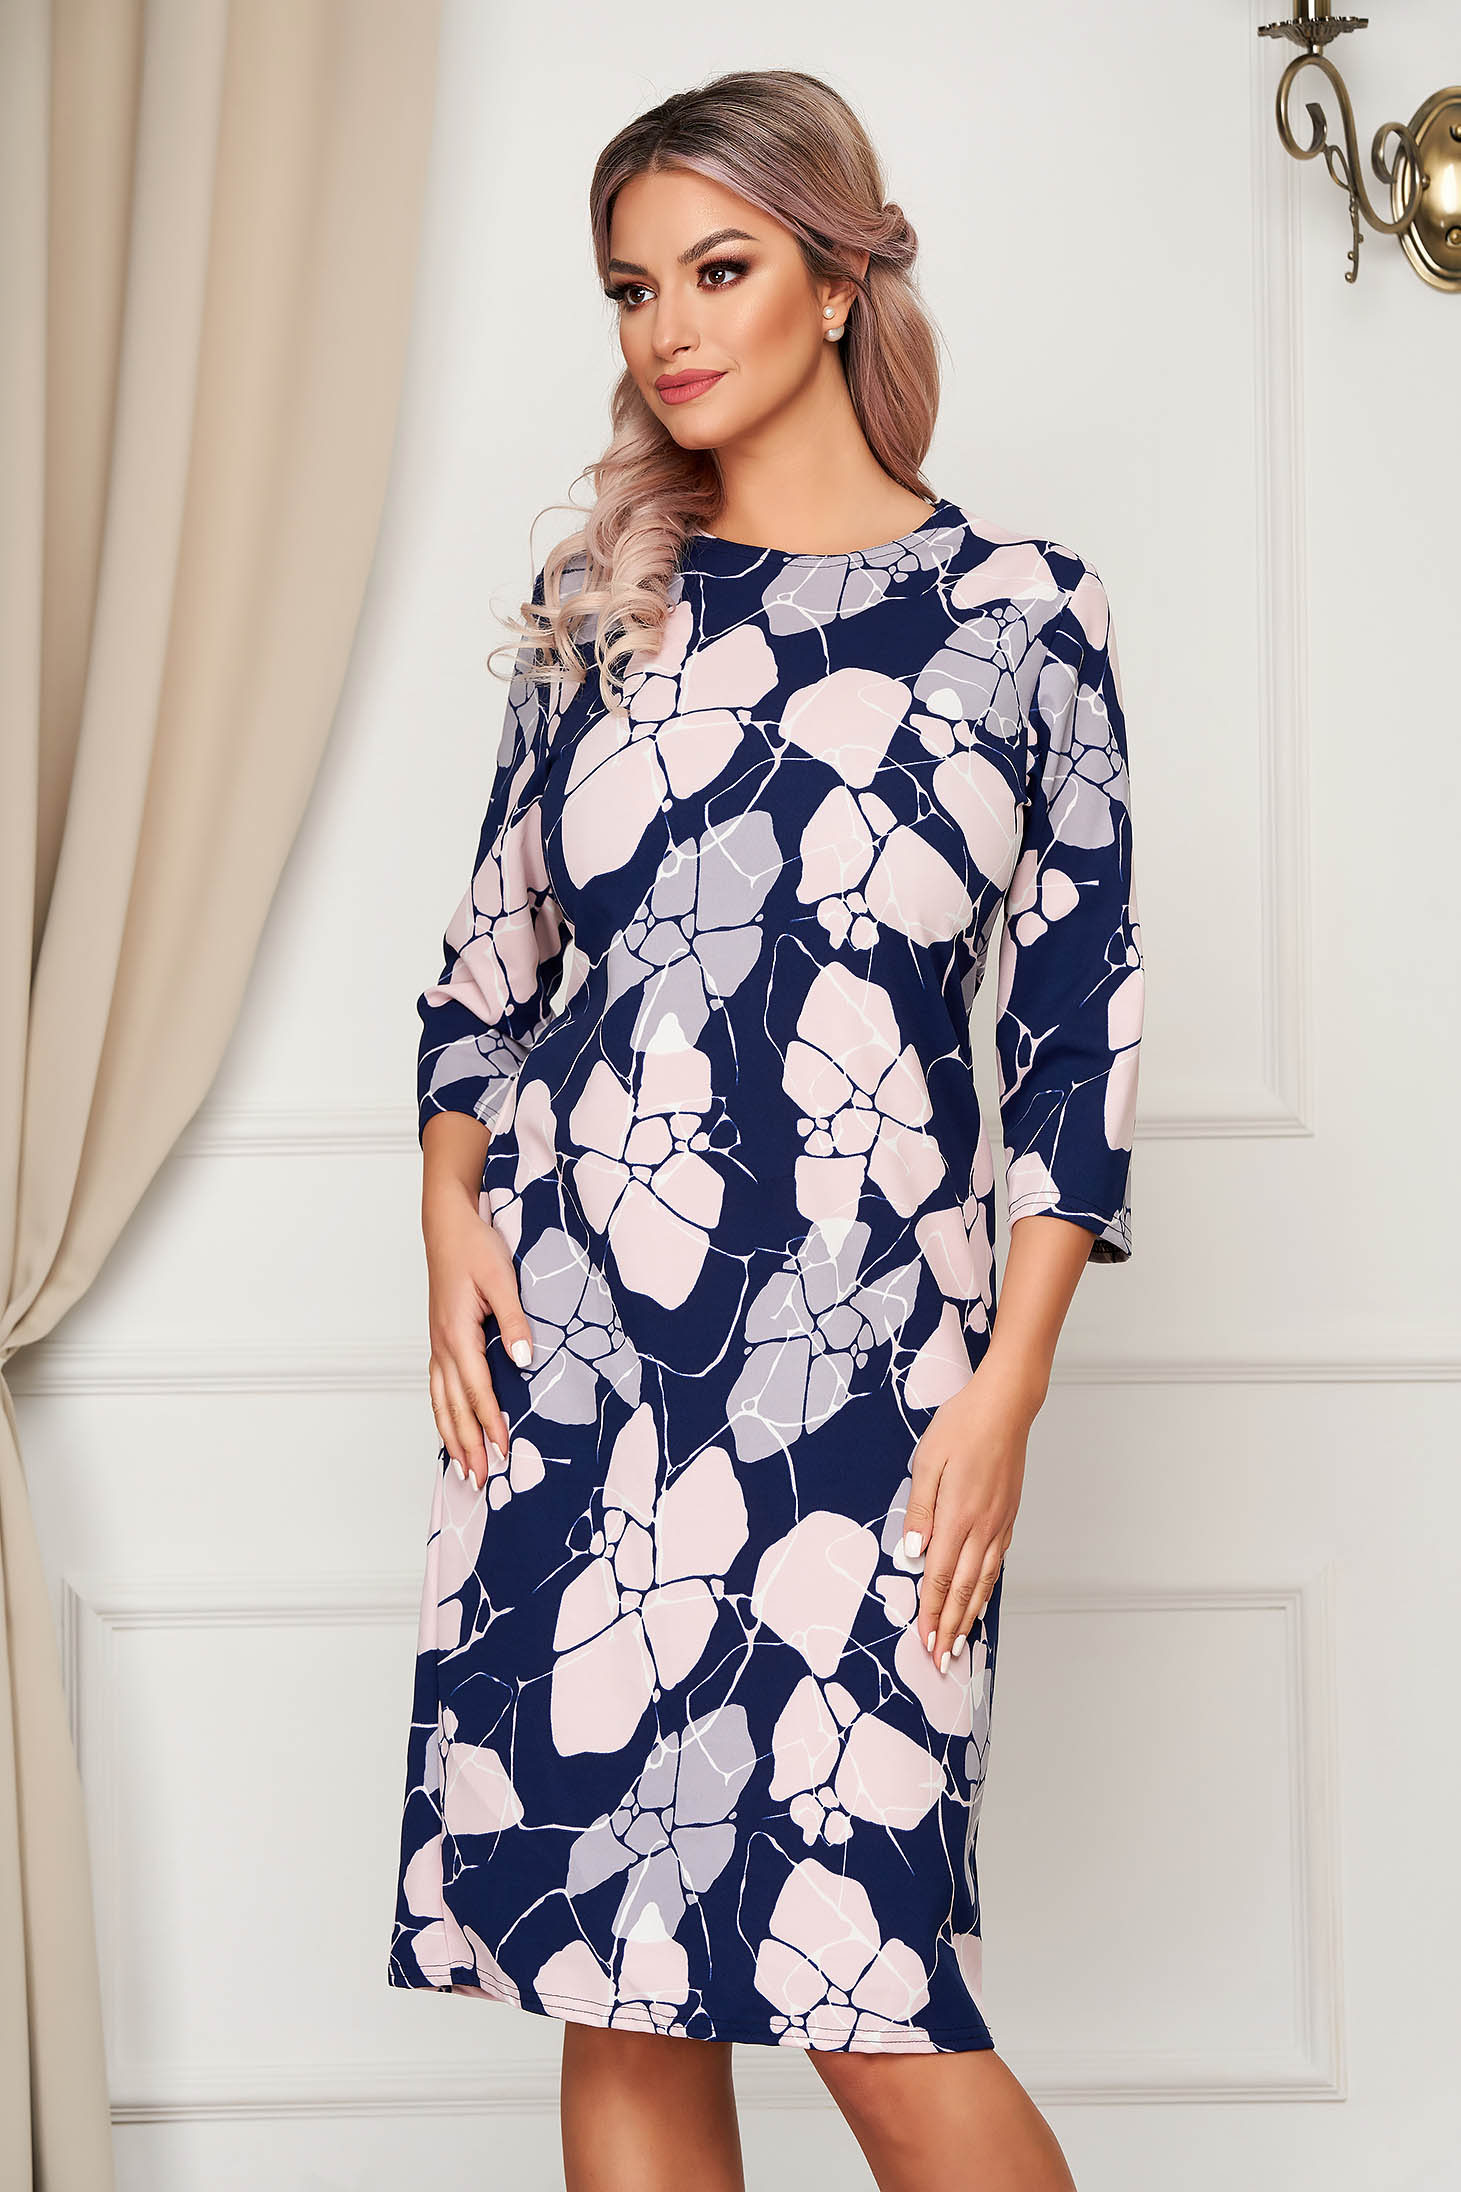 Darkblue dress midi daily from elastic fabric thin fabric straight